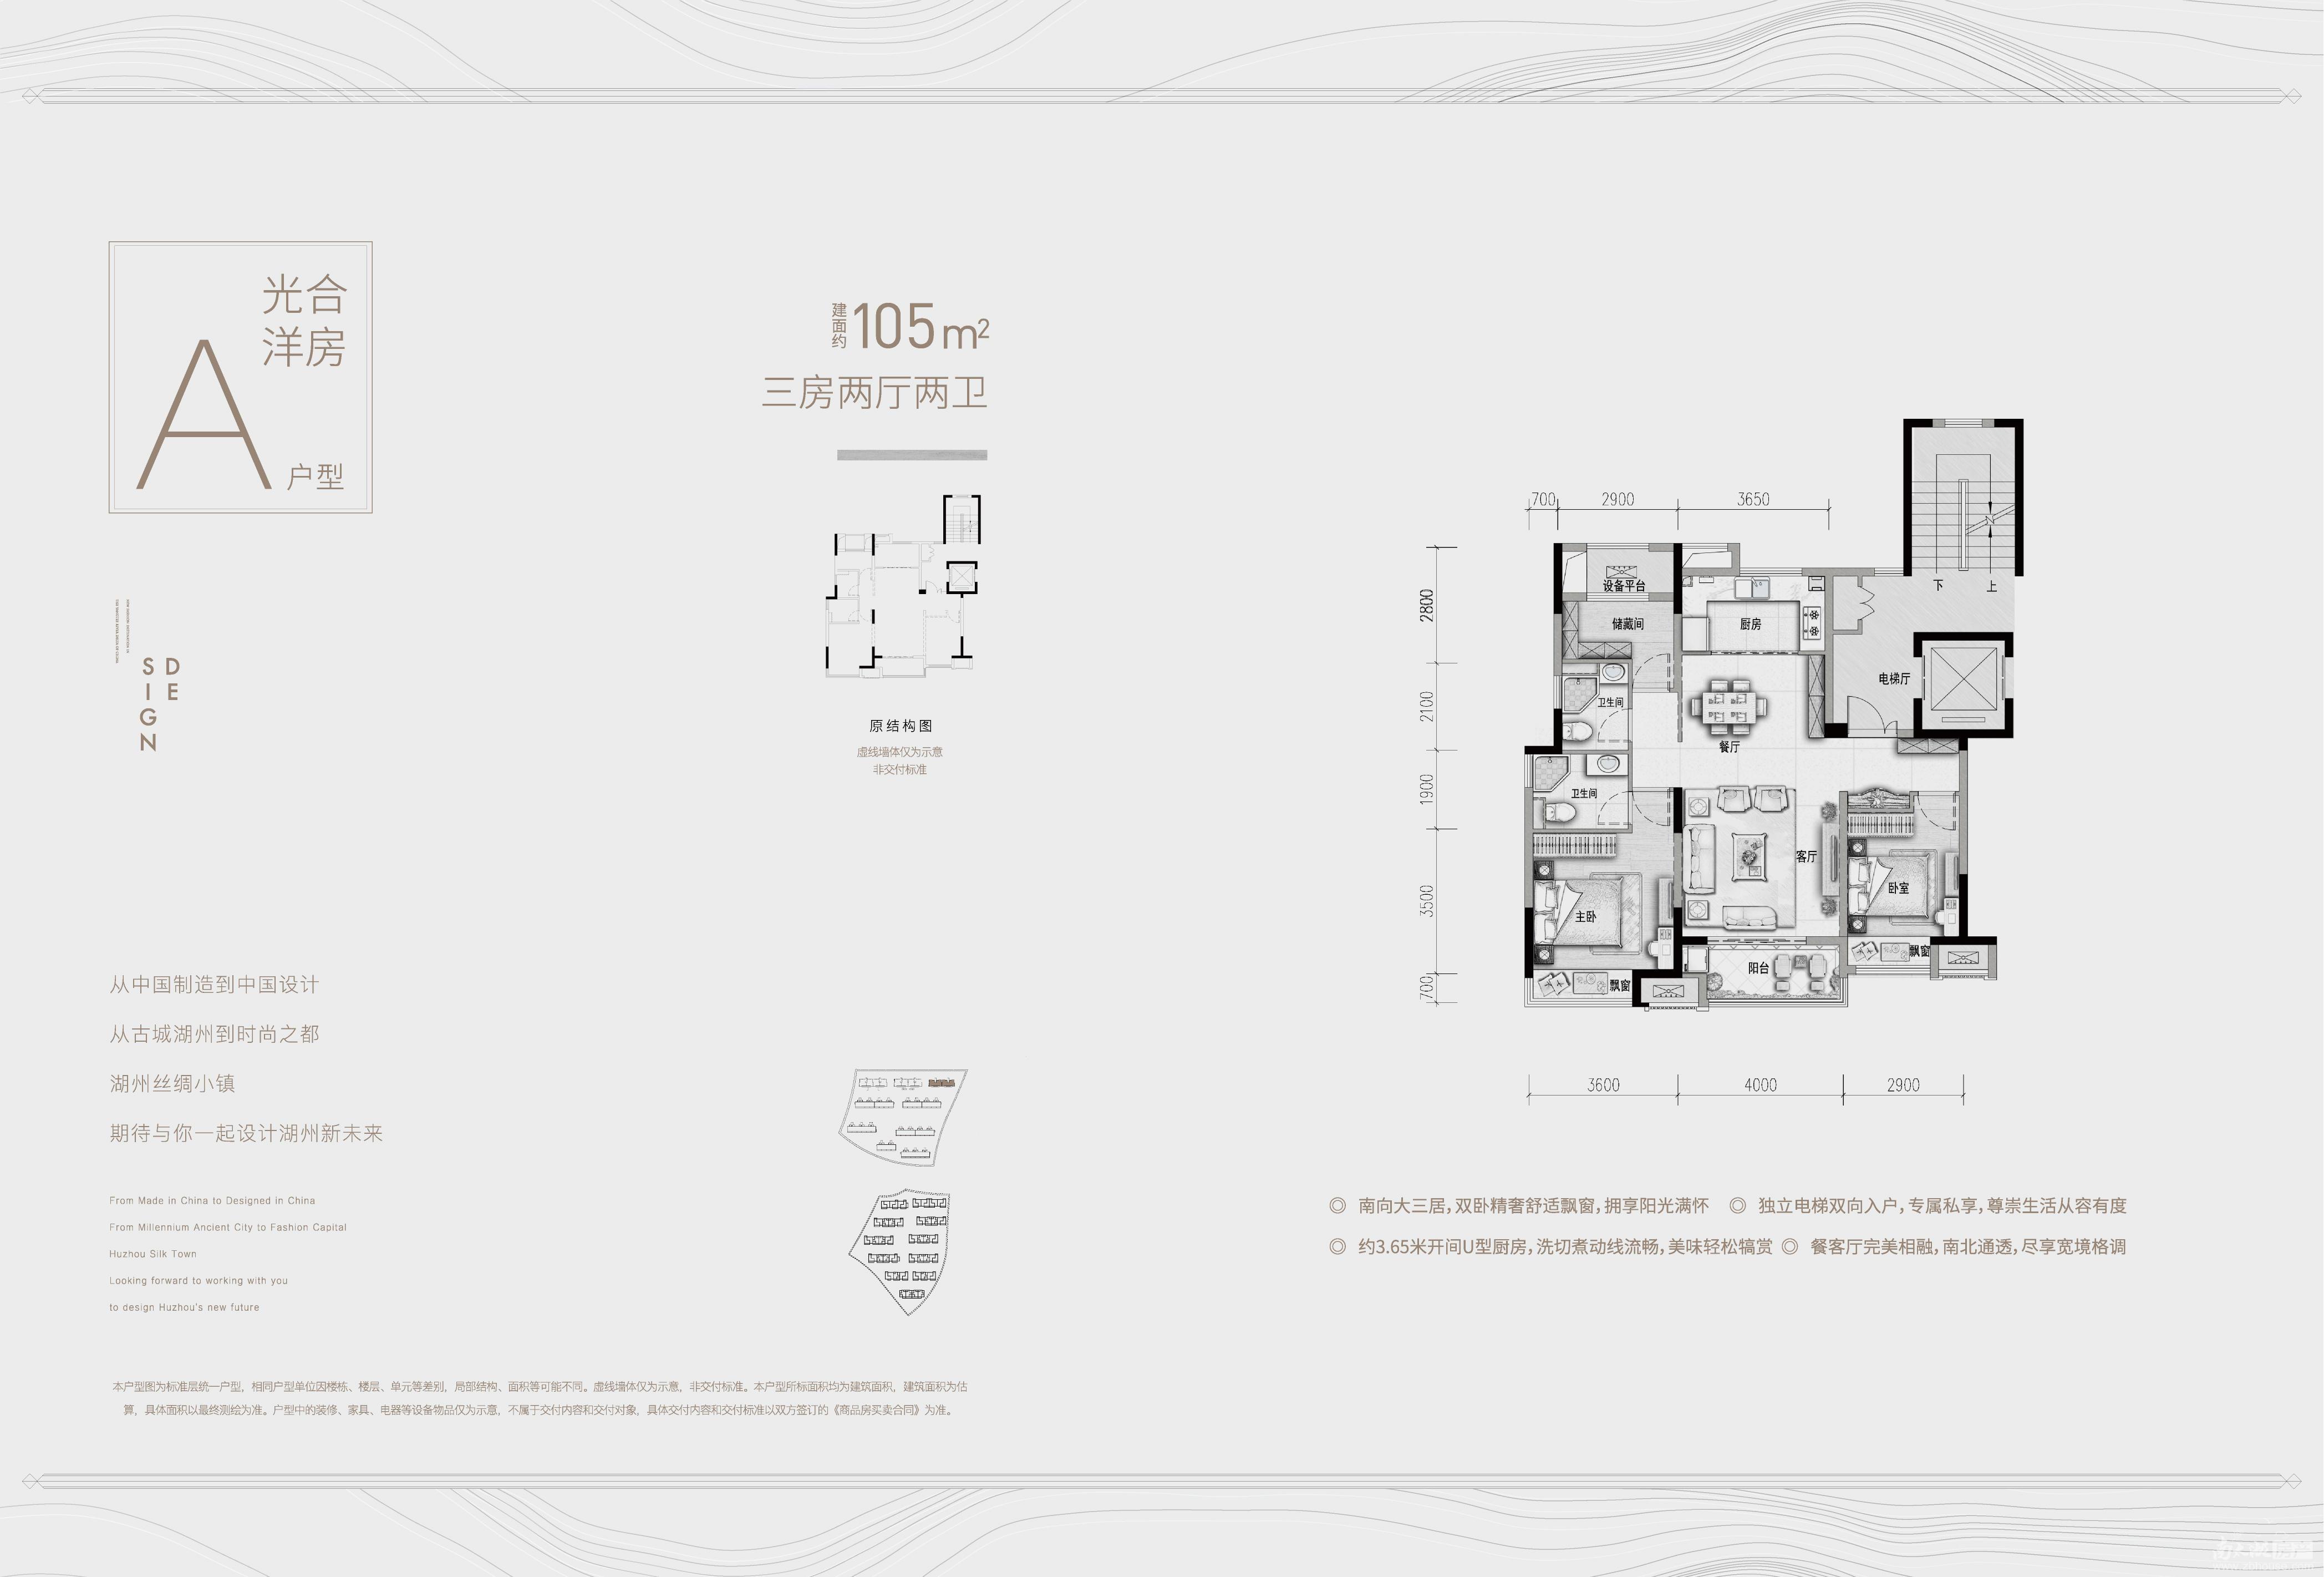 A户型 光合洋房 105m²